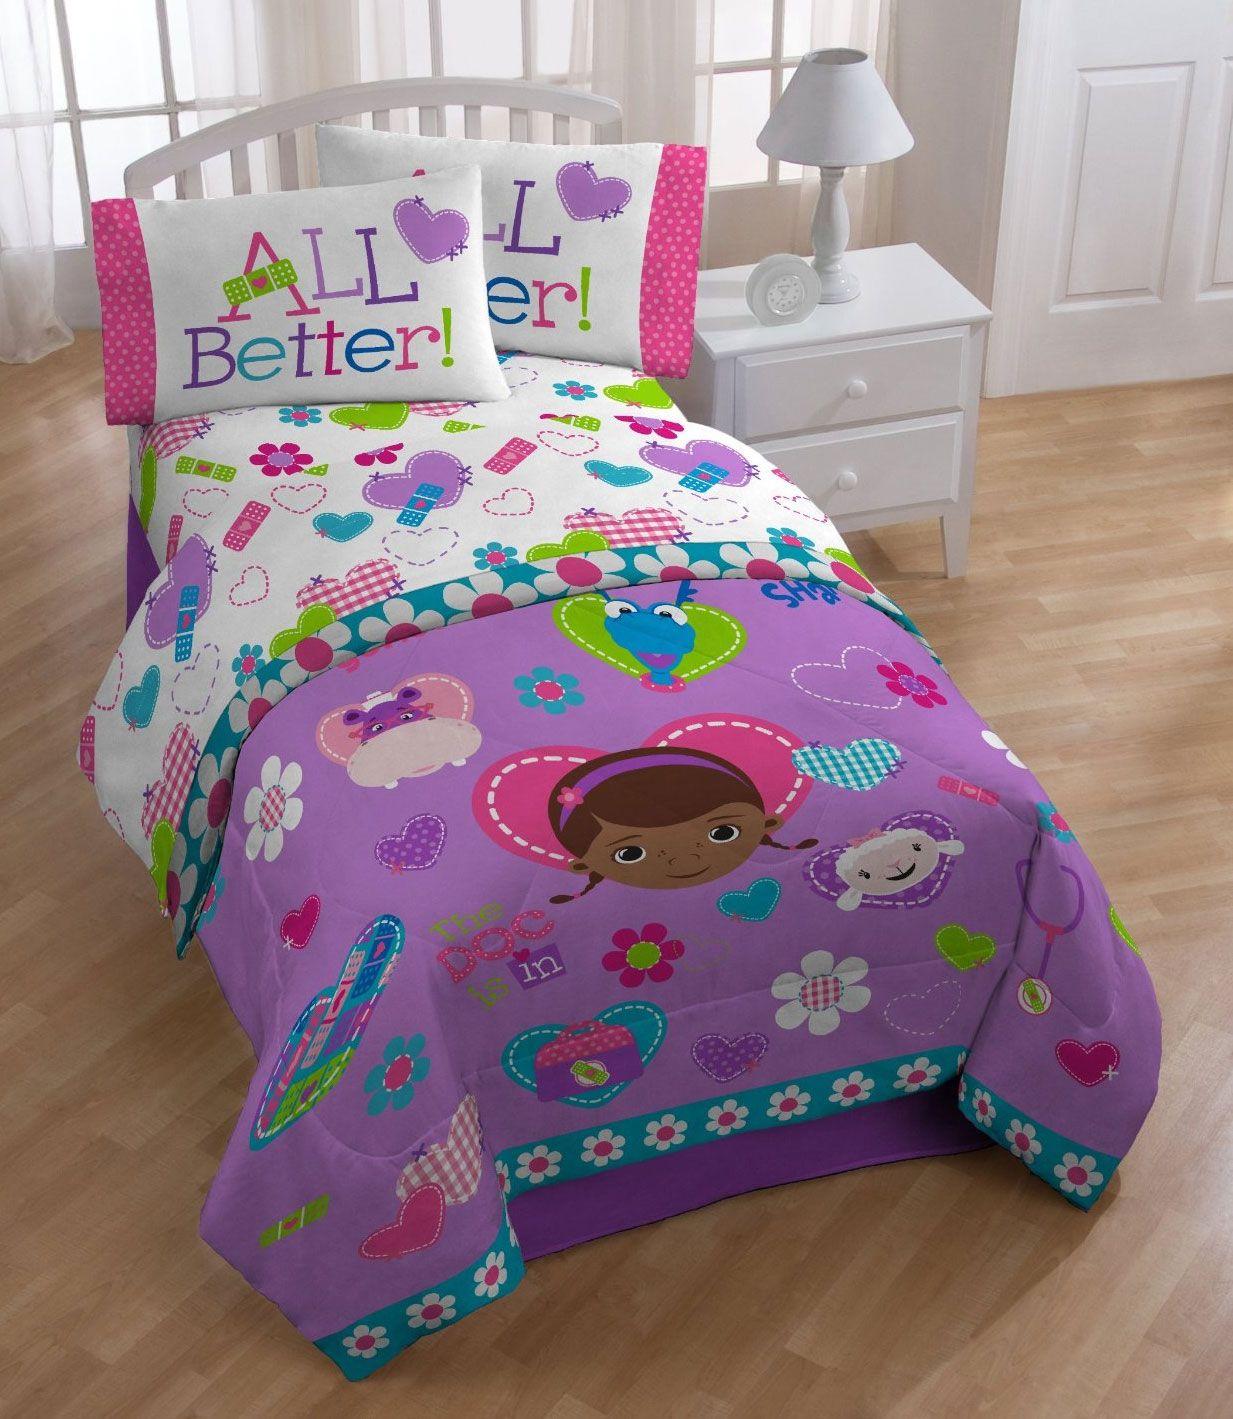 disney doc mcstuffins twin comforter  animal friends